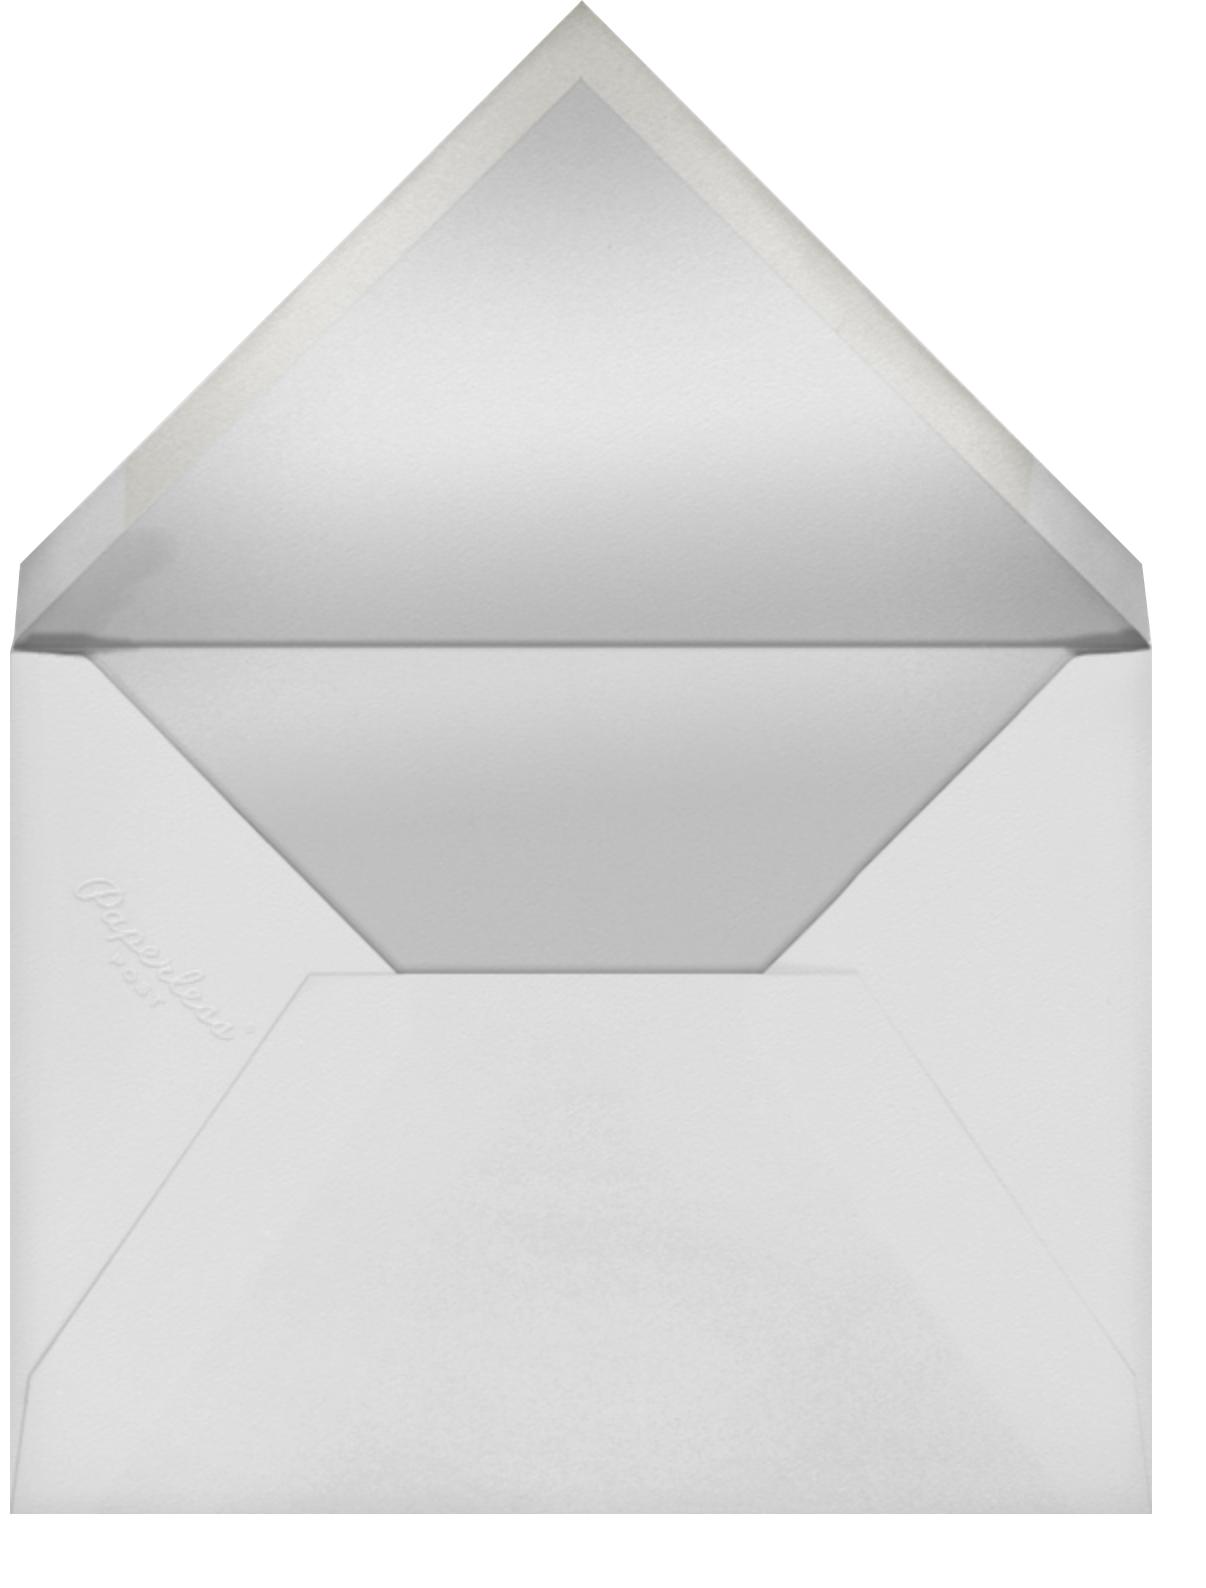 Ikat Dot (Menu) - Dark Blue - Oscar de la Renta - Envelope